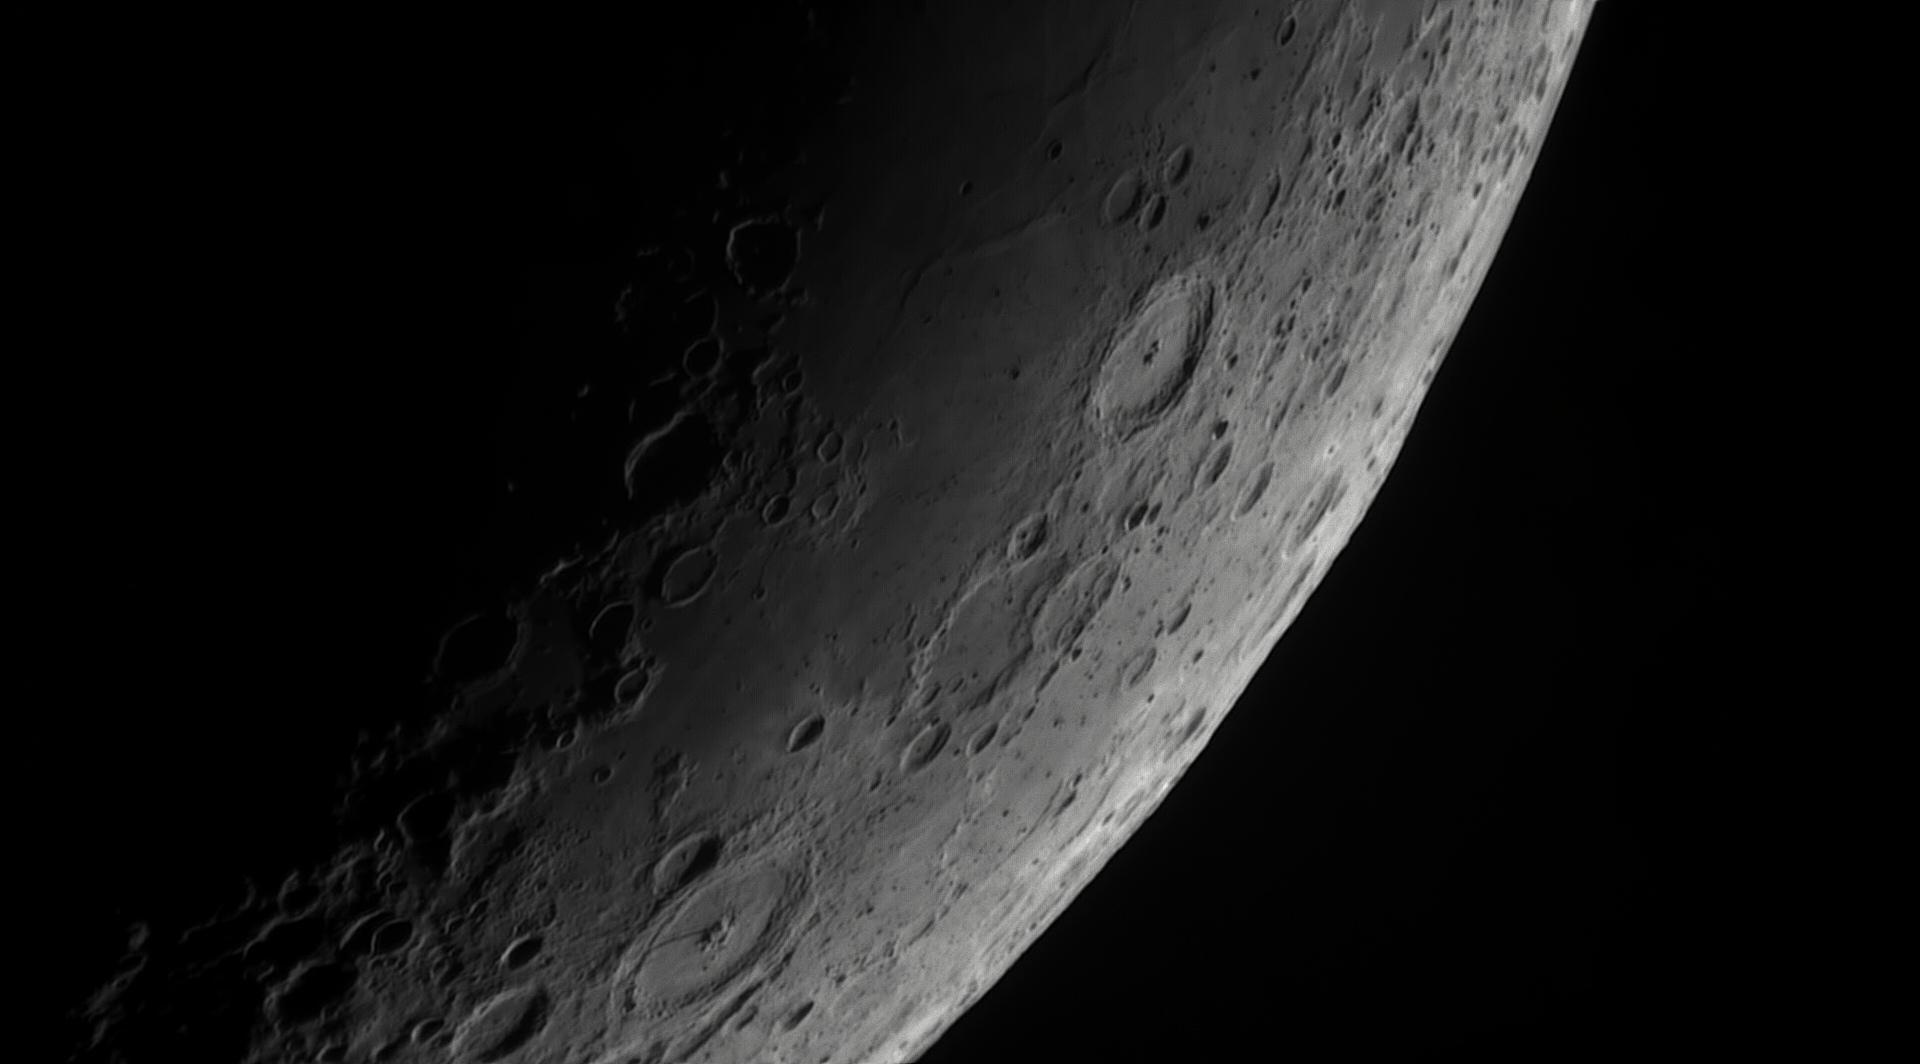 5cf9d1859da85_Moon_205217_060619_ZWOASI290MM_IR_680nm_AS_P35_lapl4_ap186.jpg.8e2e7f56a6afd48cc18b715d00d667cc.jpg